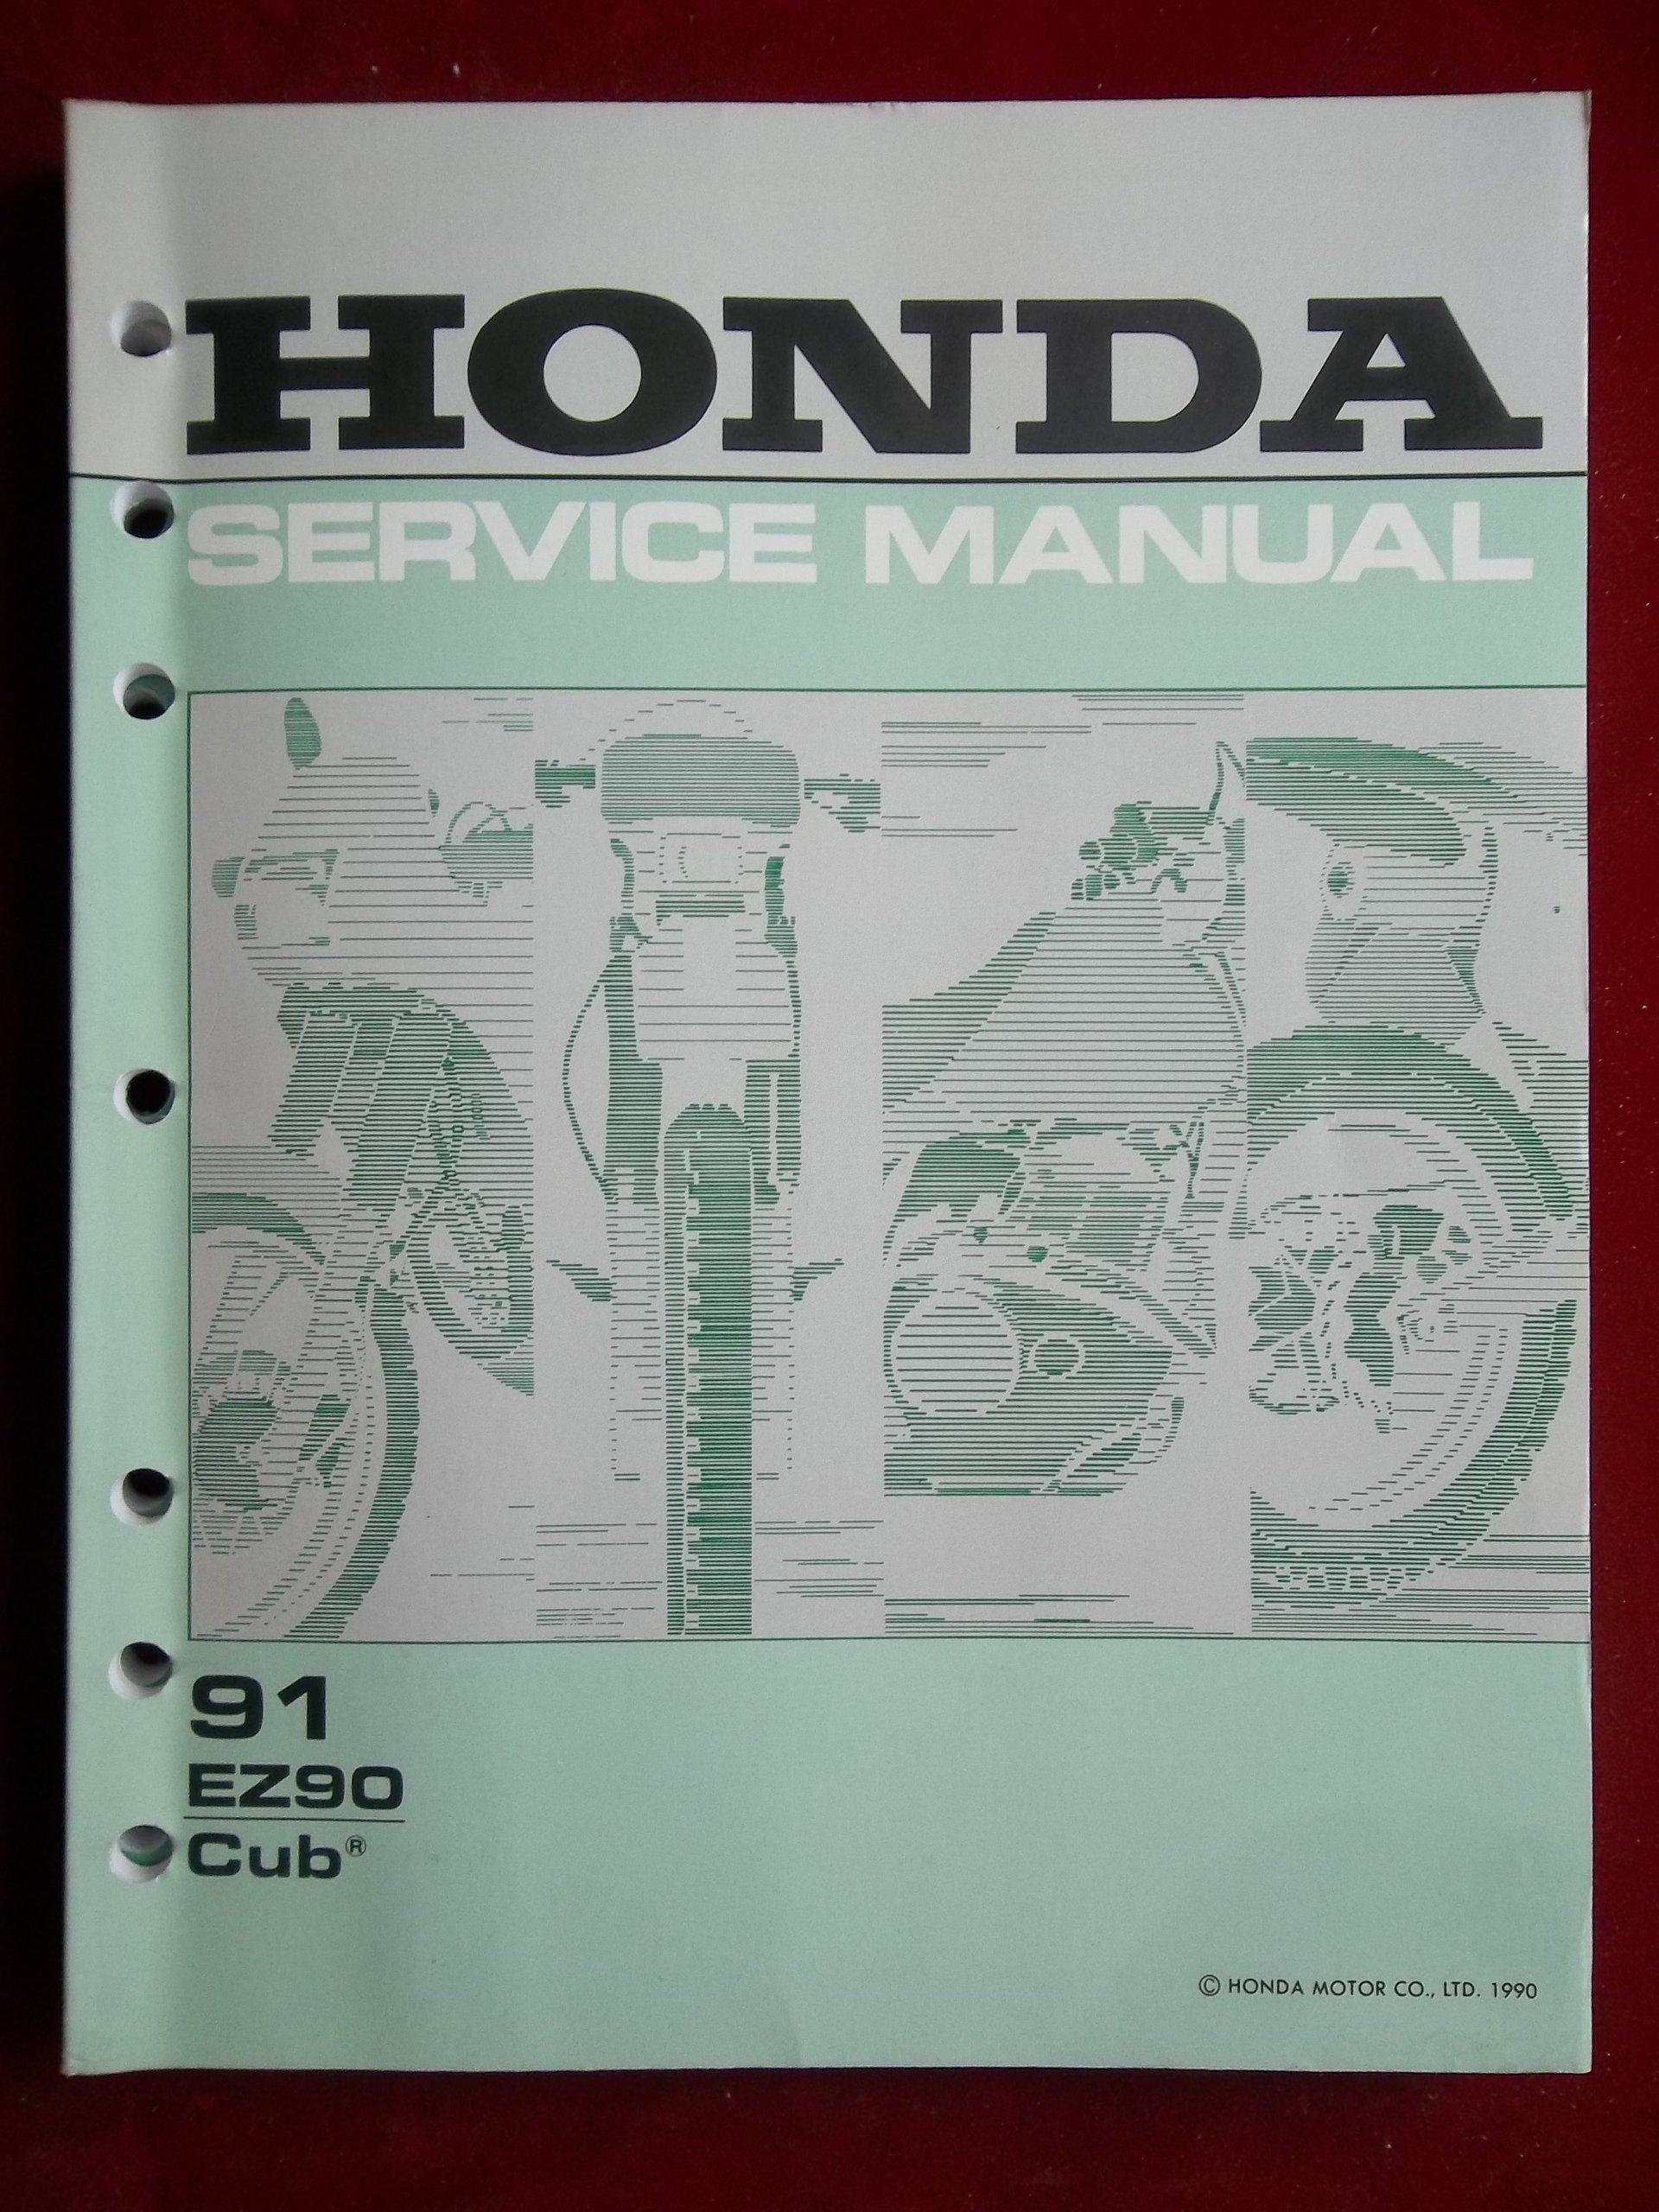 1991 EZ90 EZ 90 Cub Honda Service Shop Repair Manual 61GZ400: HONDA:  Amazon.com: Books